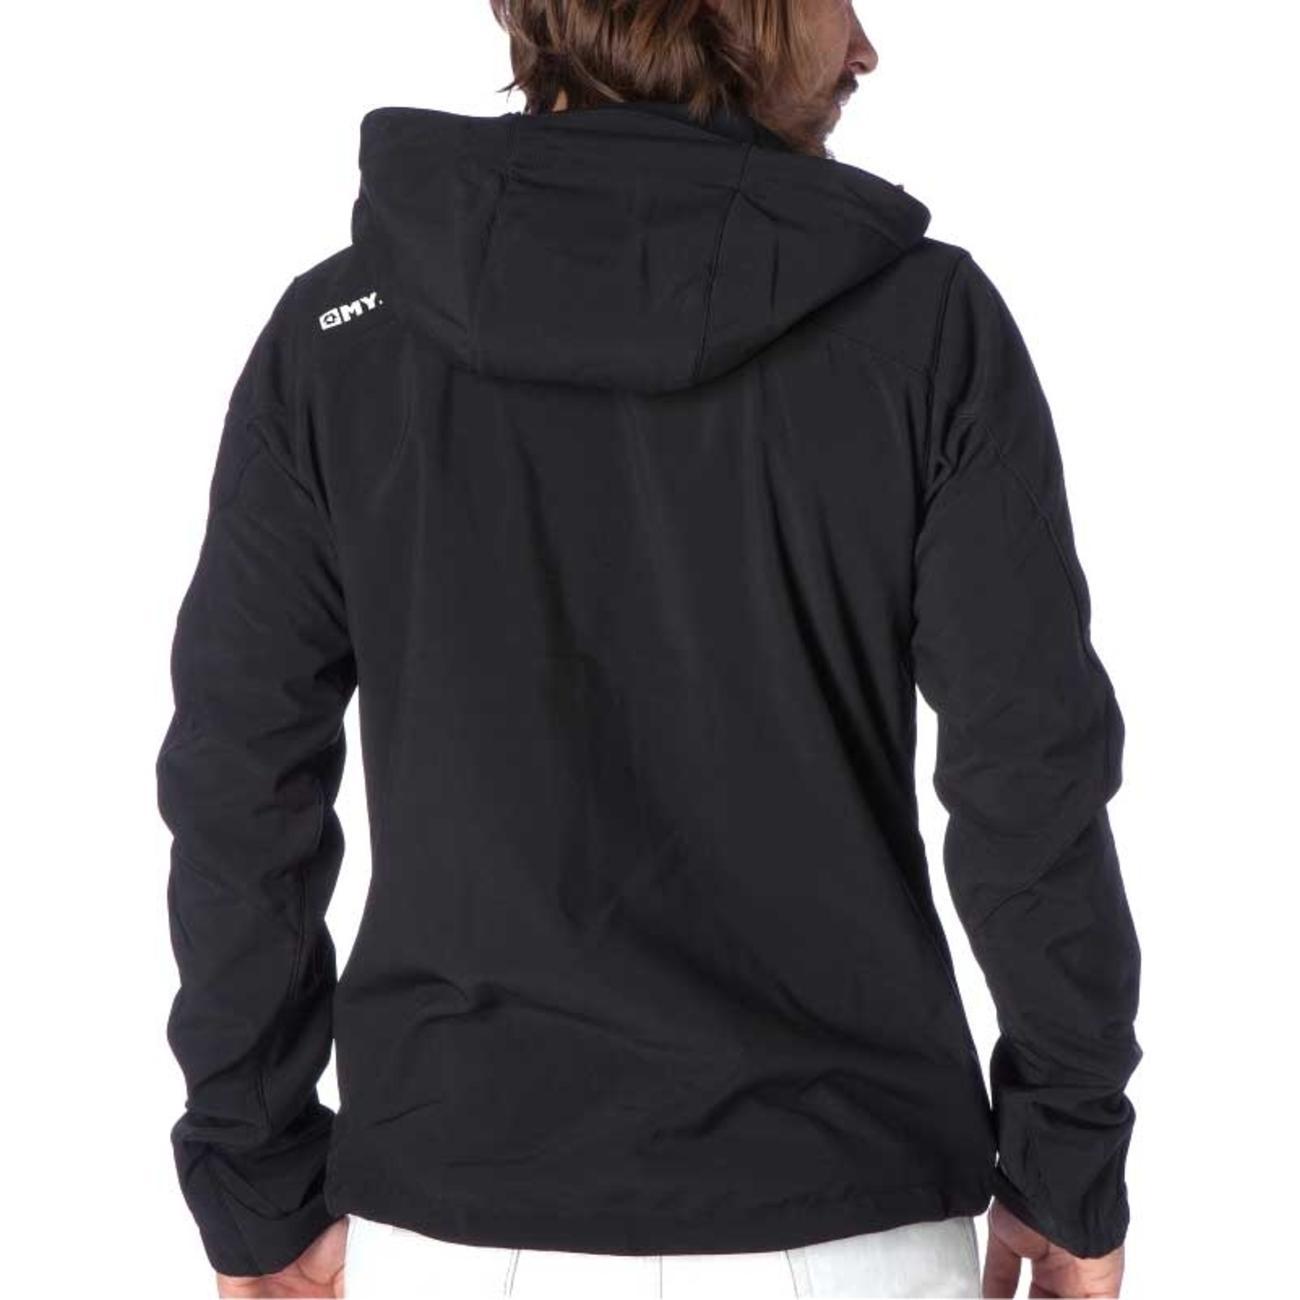 Global 3.0 Jacket 3レイヤー 防水ソフトシェルジャケット